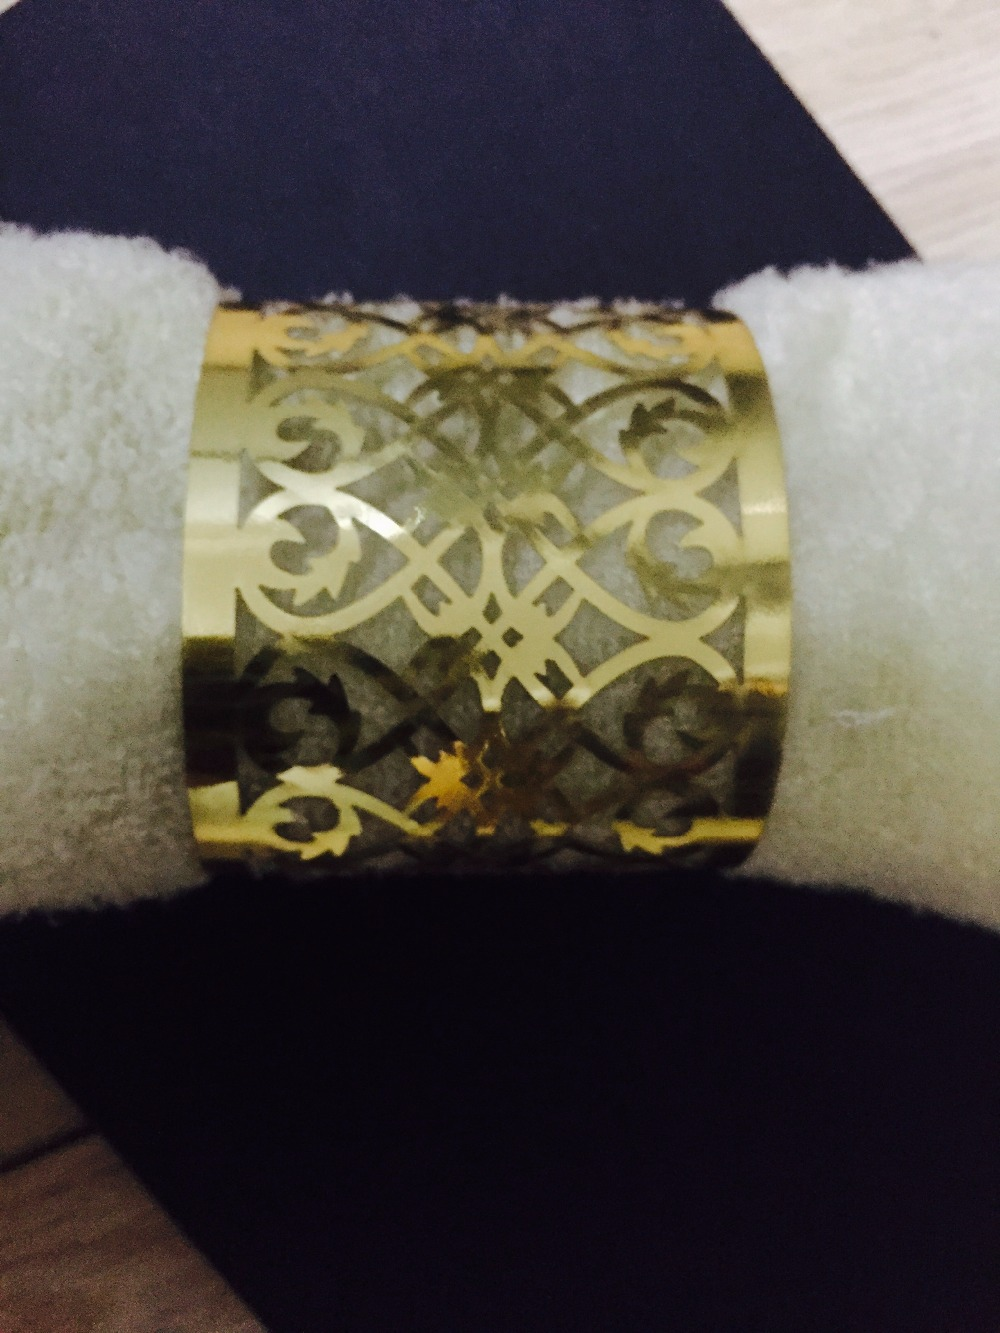 50pieces Metallic Gold Color Towel Wrappers,Laser Cut